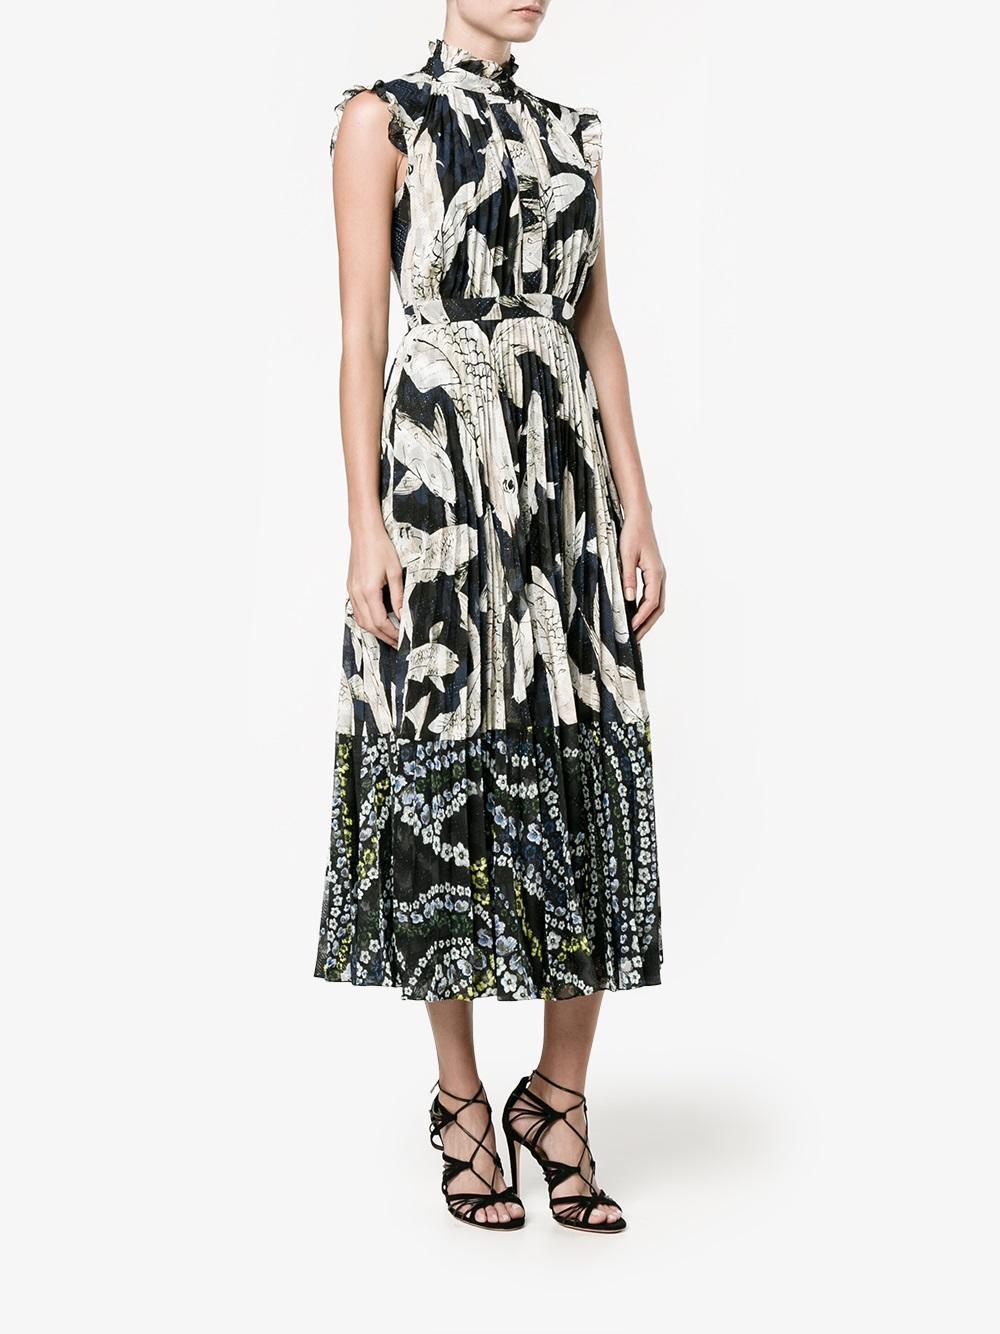 Erdem koi fish print dress in black lyst for Koi fish dress